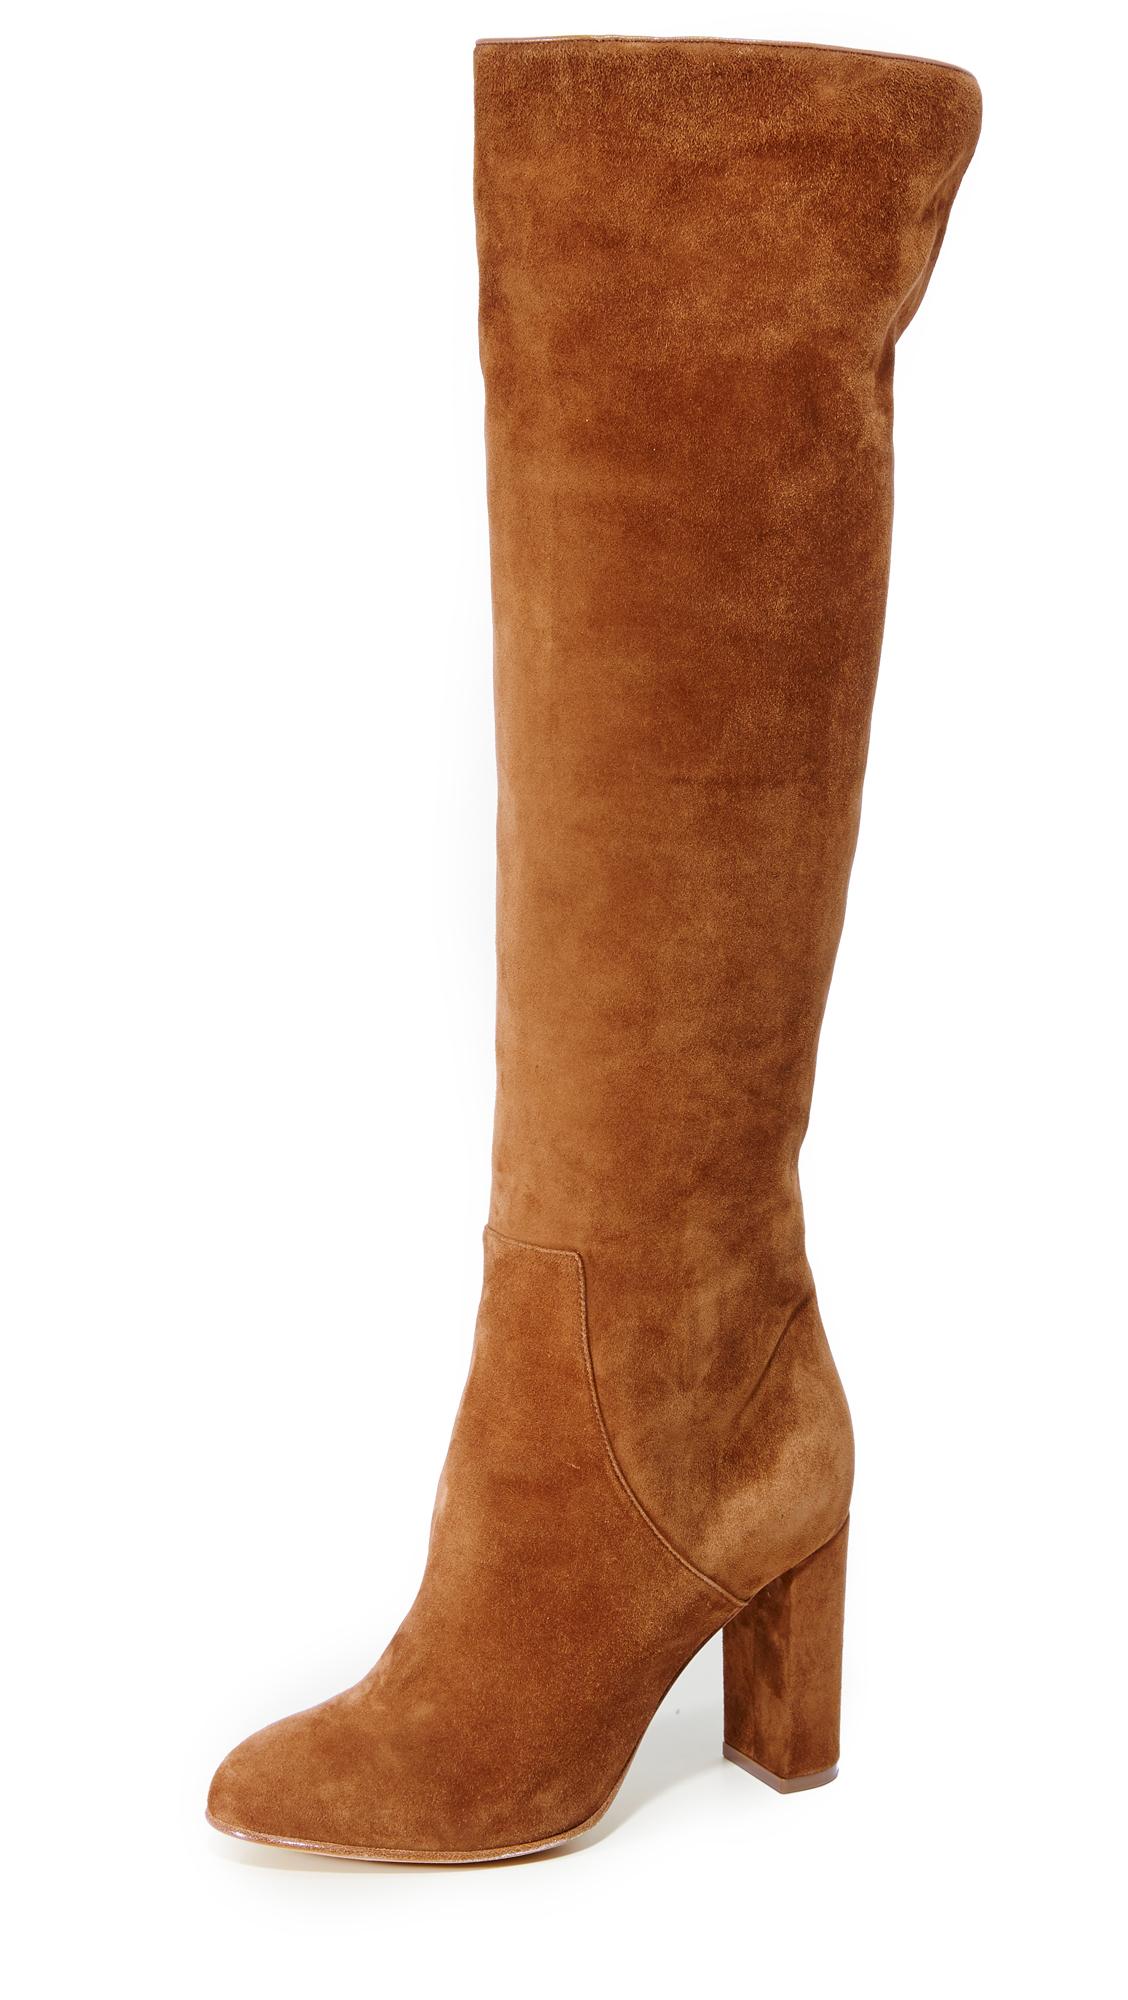 Alexa Wagner Theresa Suede Boots - Paris Texas/Tobacco